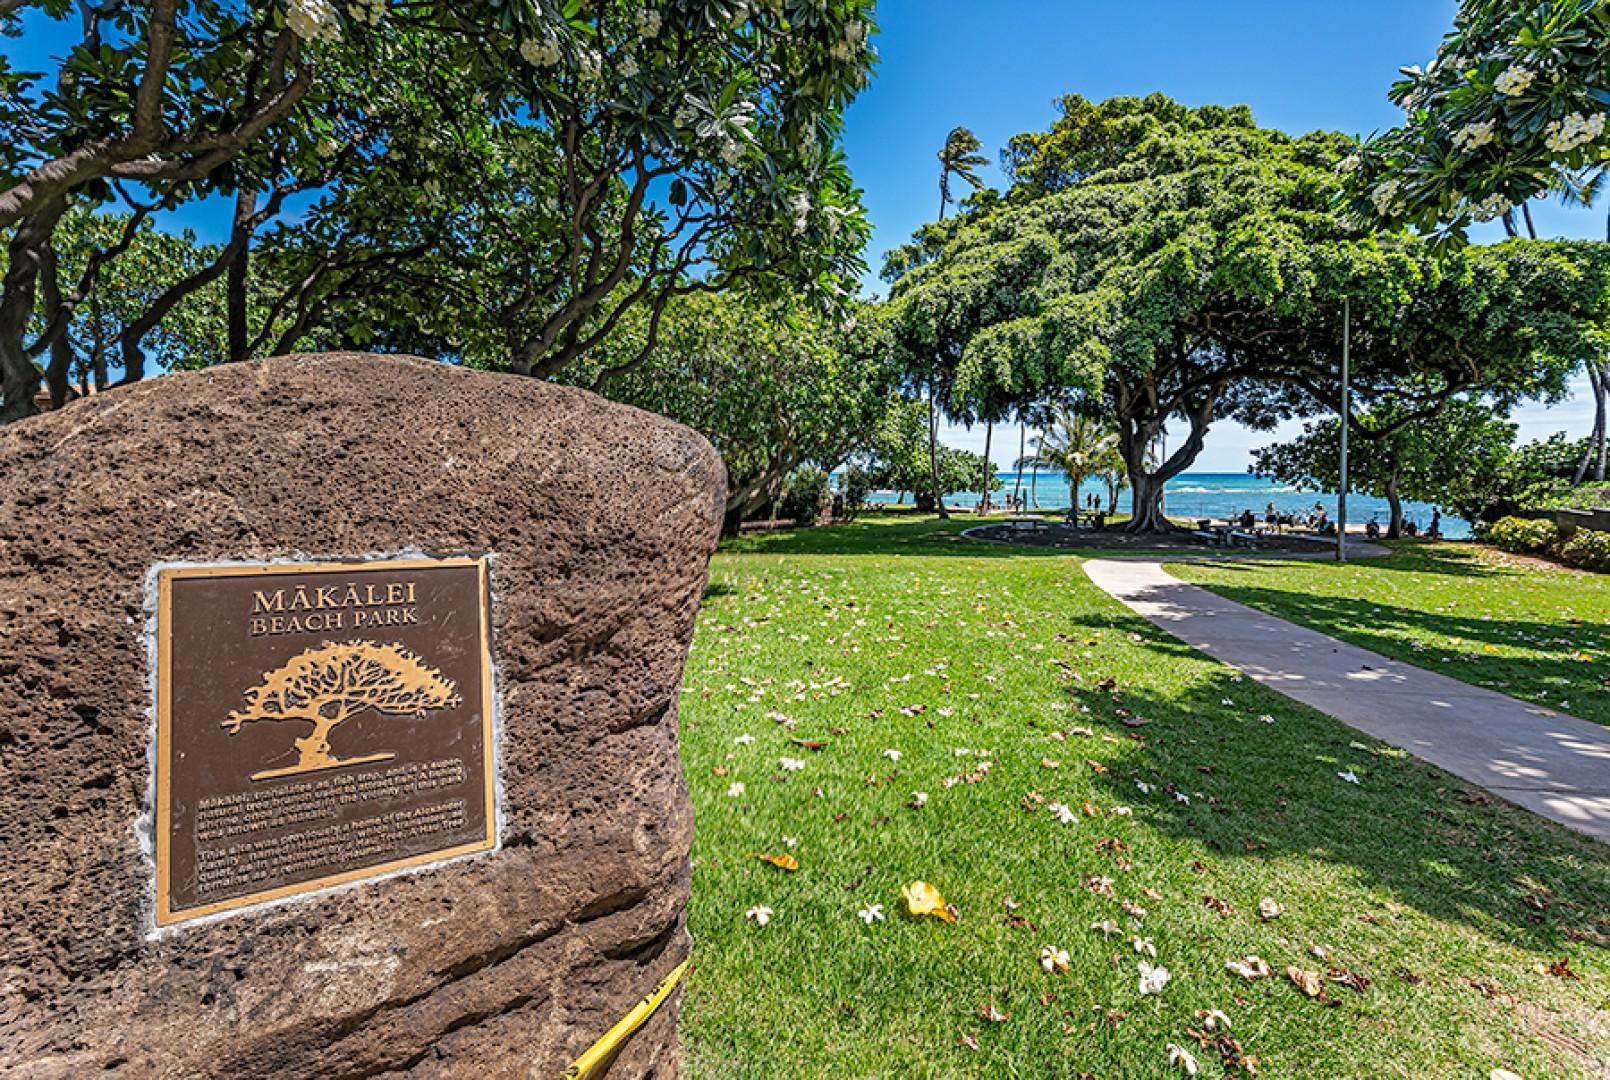 Walking distance to Makalei Beach Park